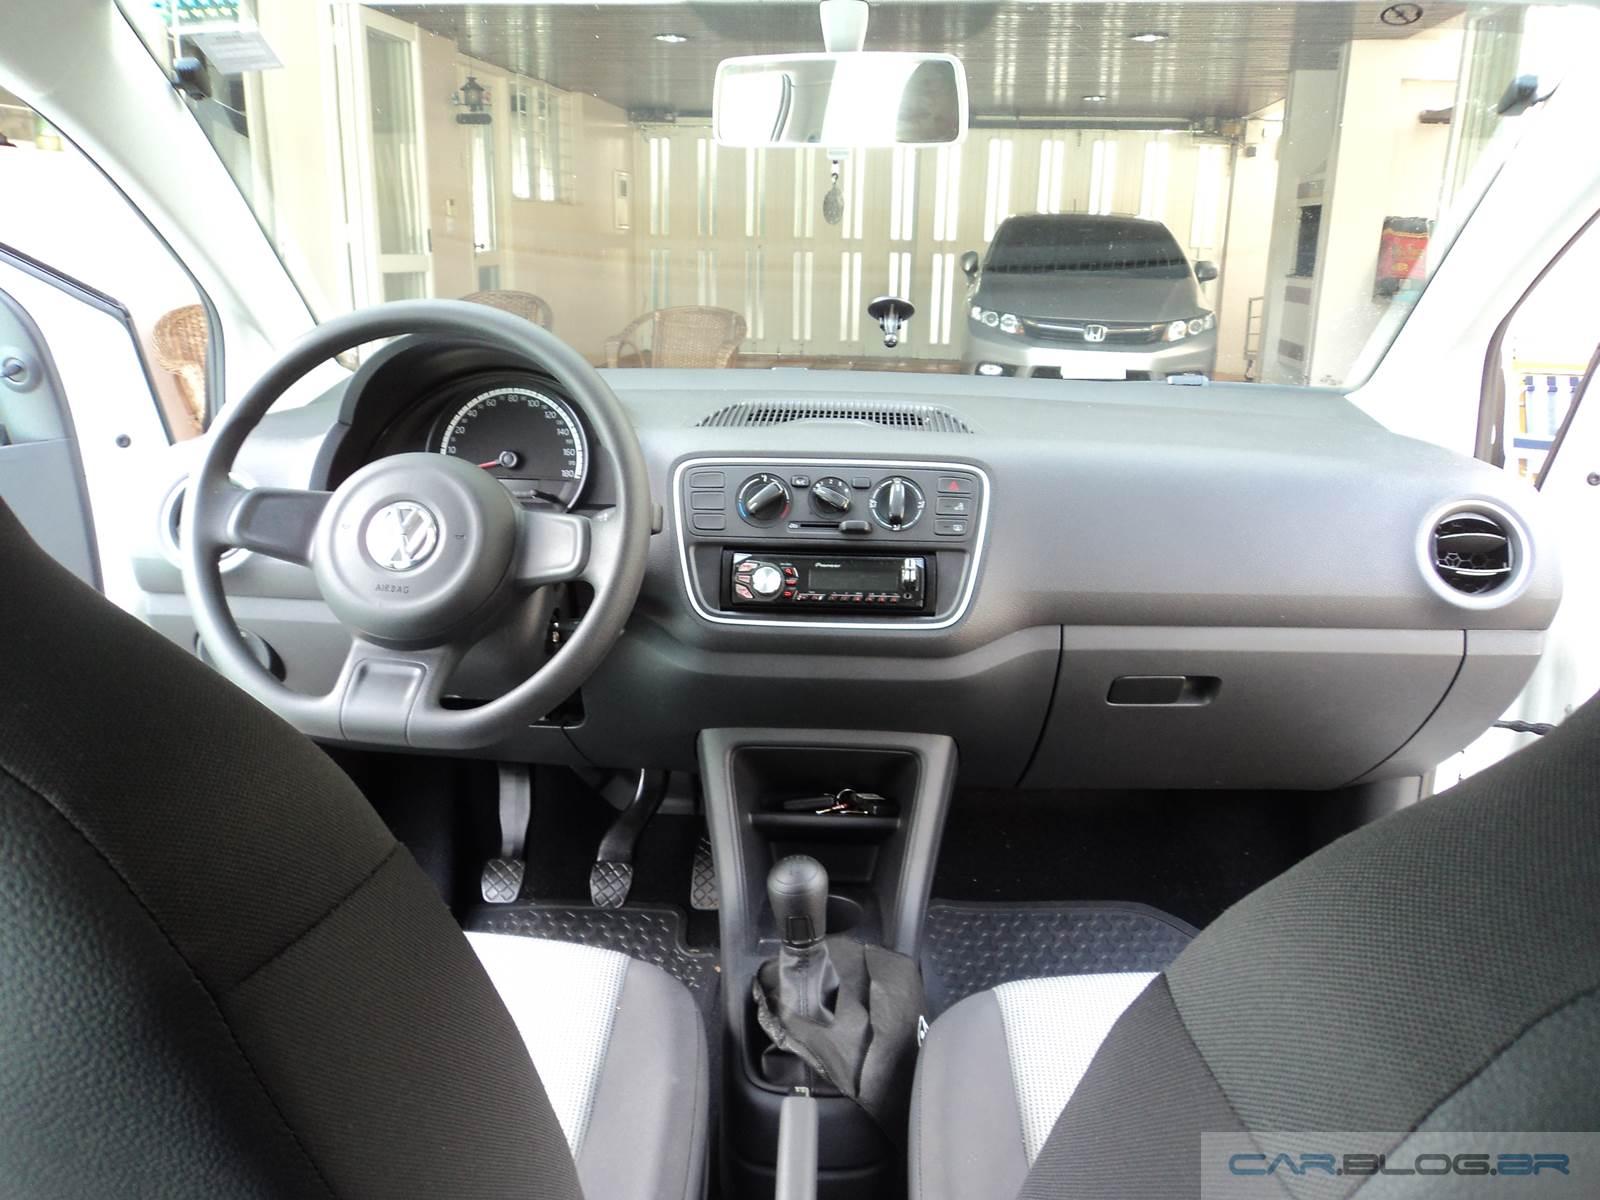 Ford Fiesta x Volkswagen up!